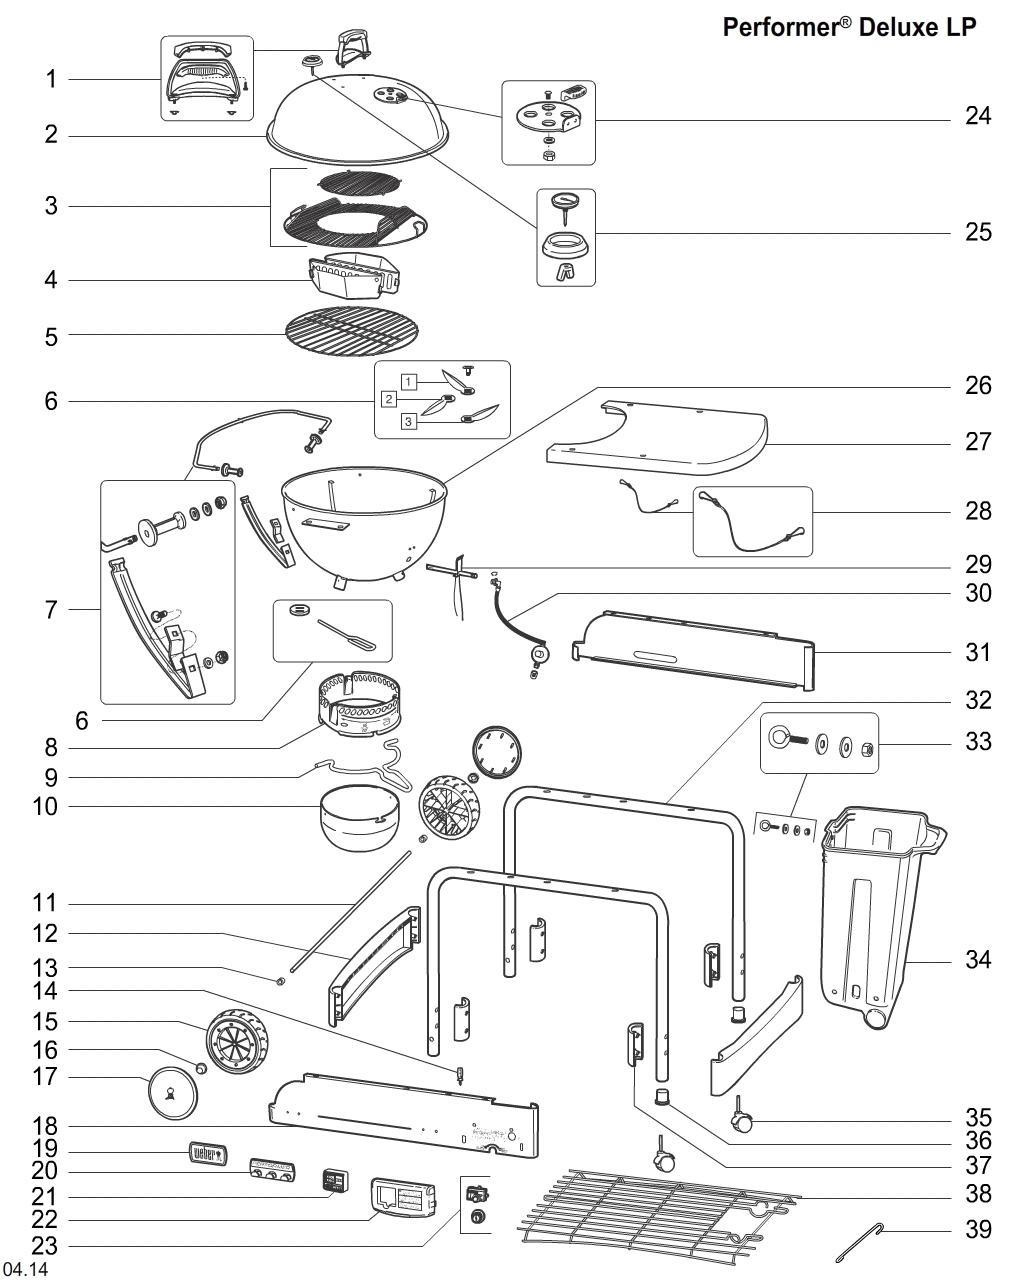 Schematic Image 15501001